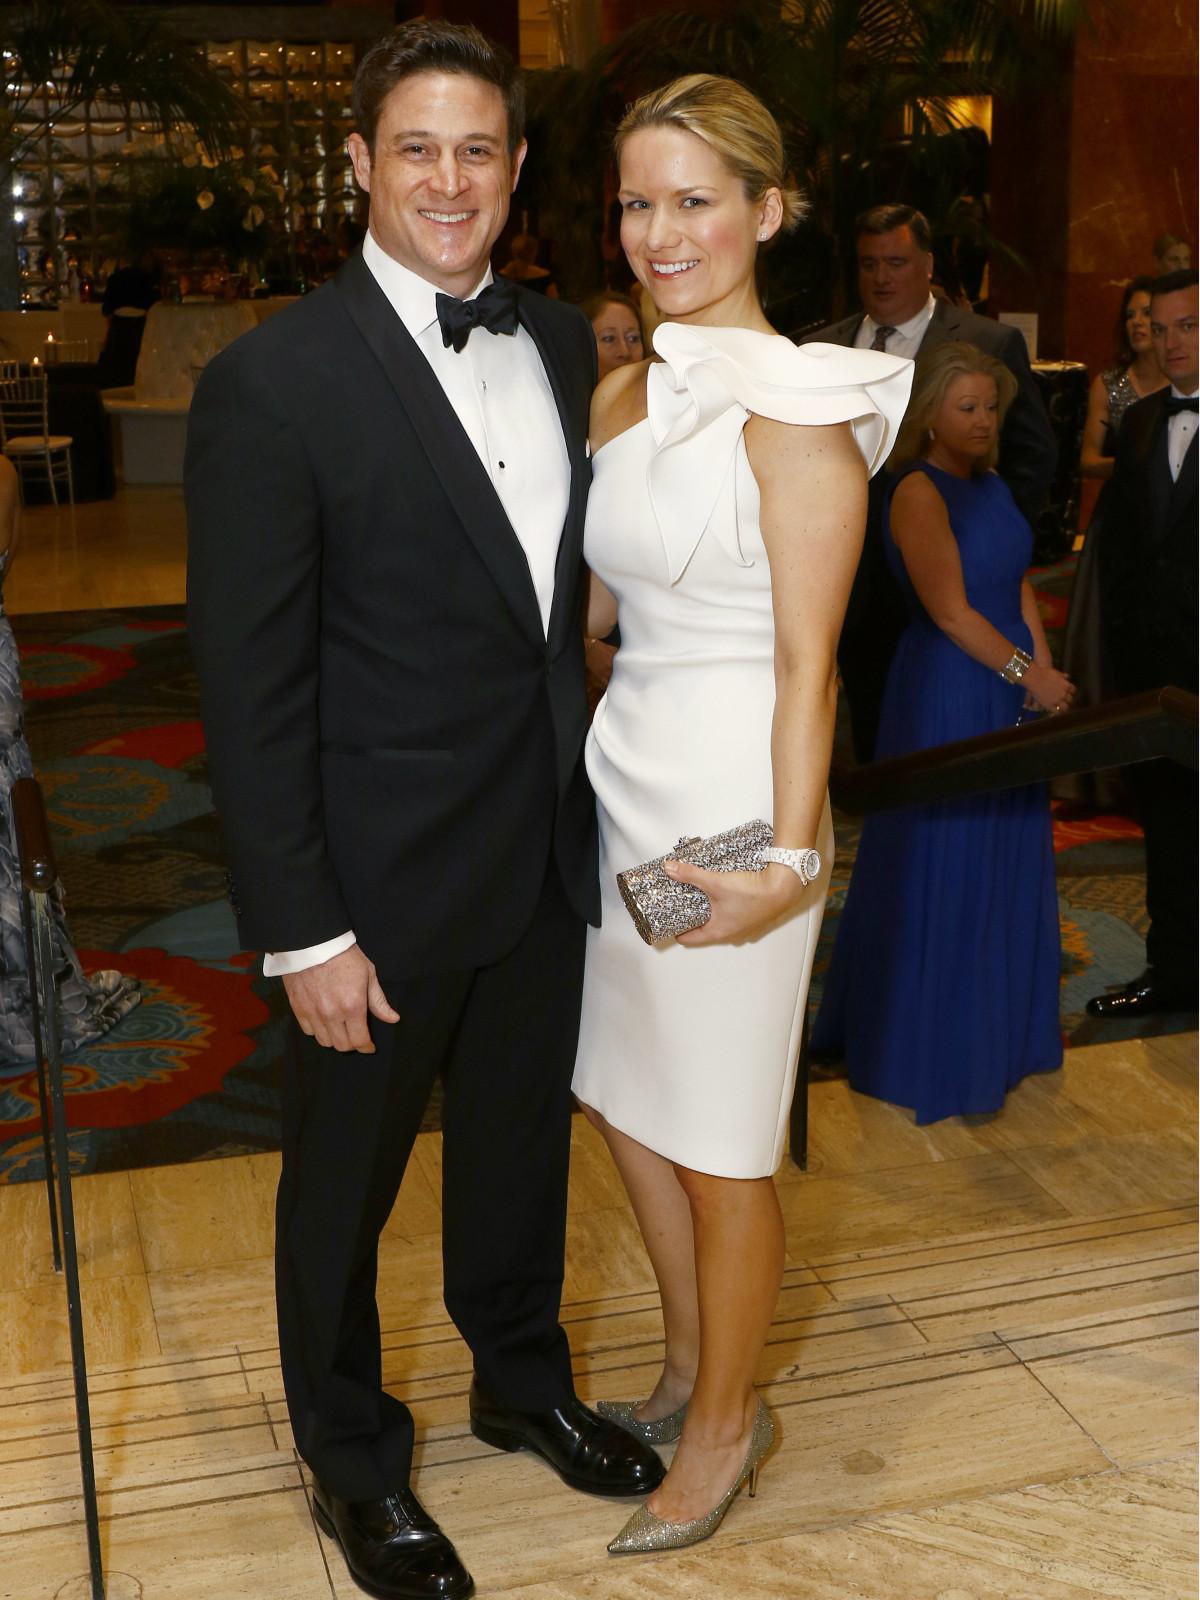 Jeff Matre, Kristina Kiik